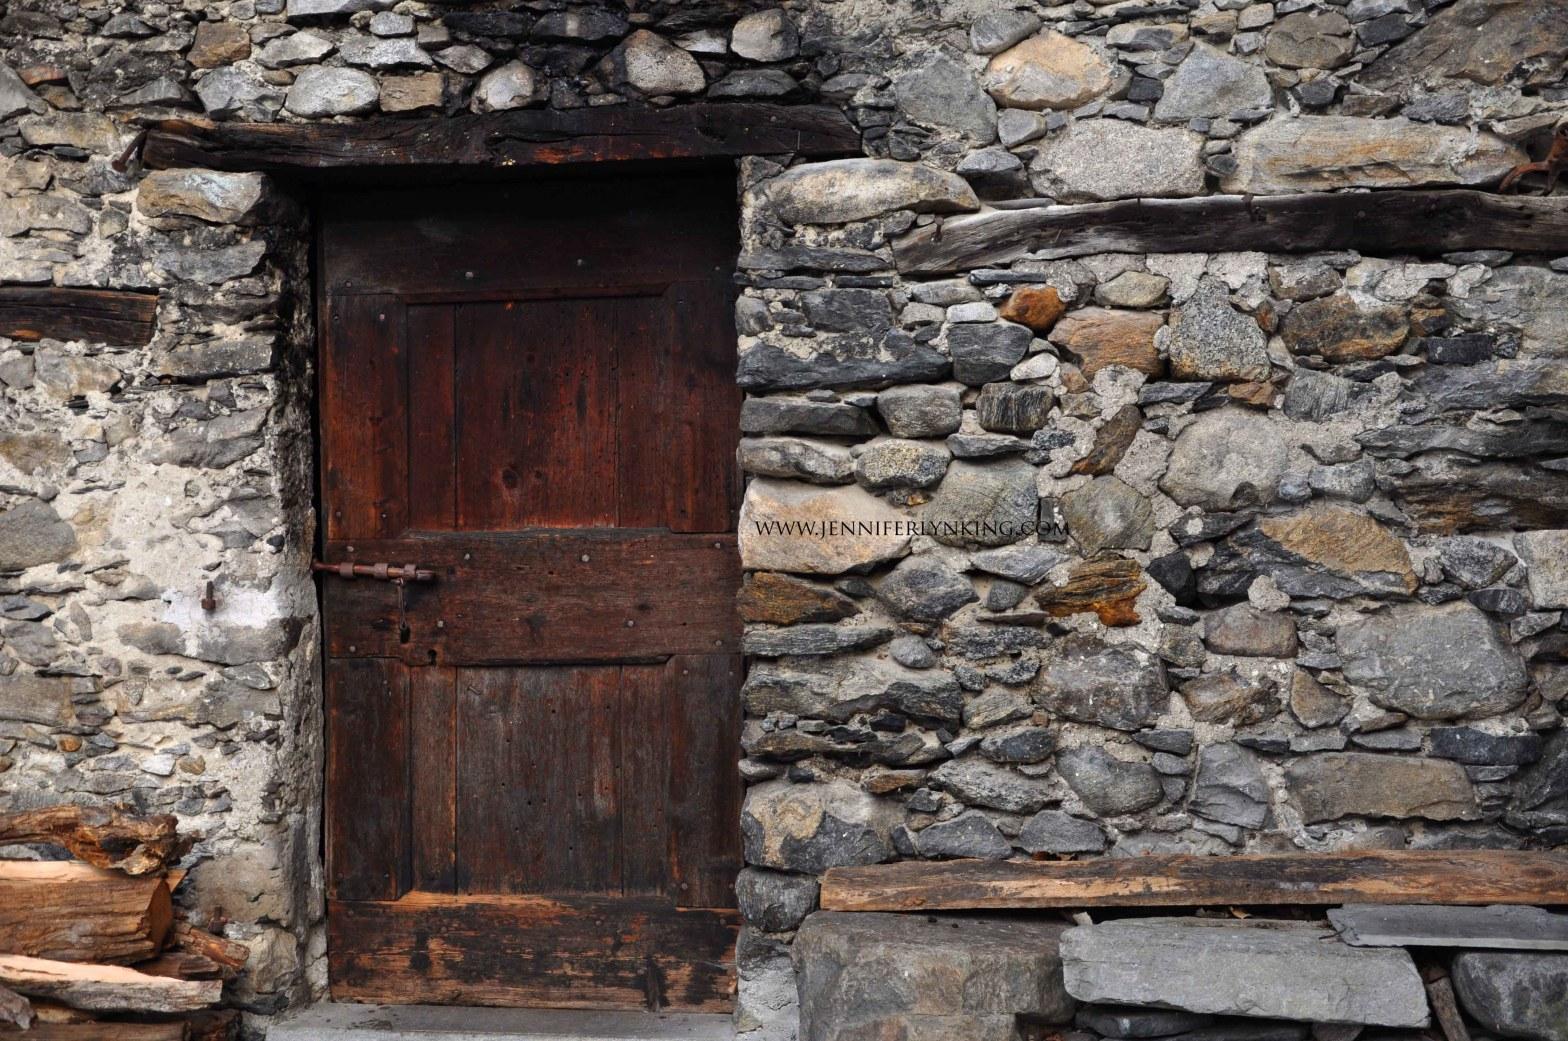 Stone village, chestnut door, Italian Alps